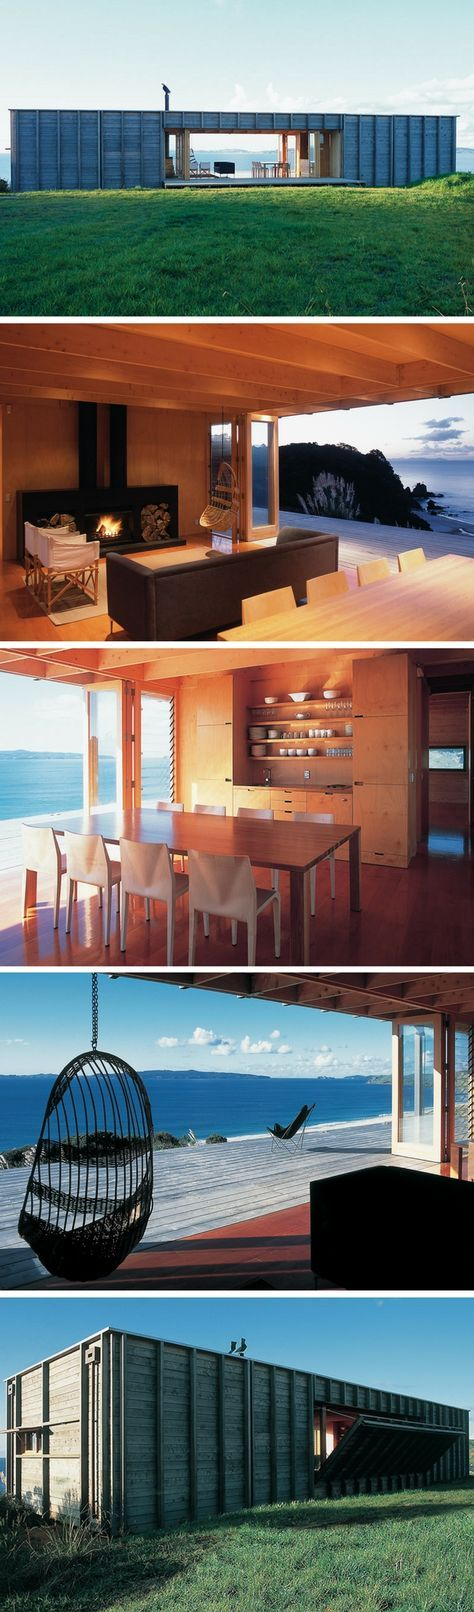 COROMANDEL BACH SHIPPING CONTAINER HOME